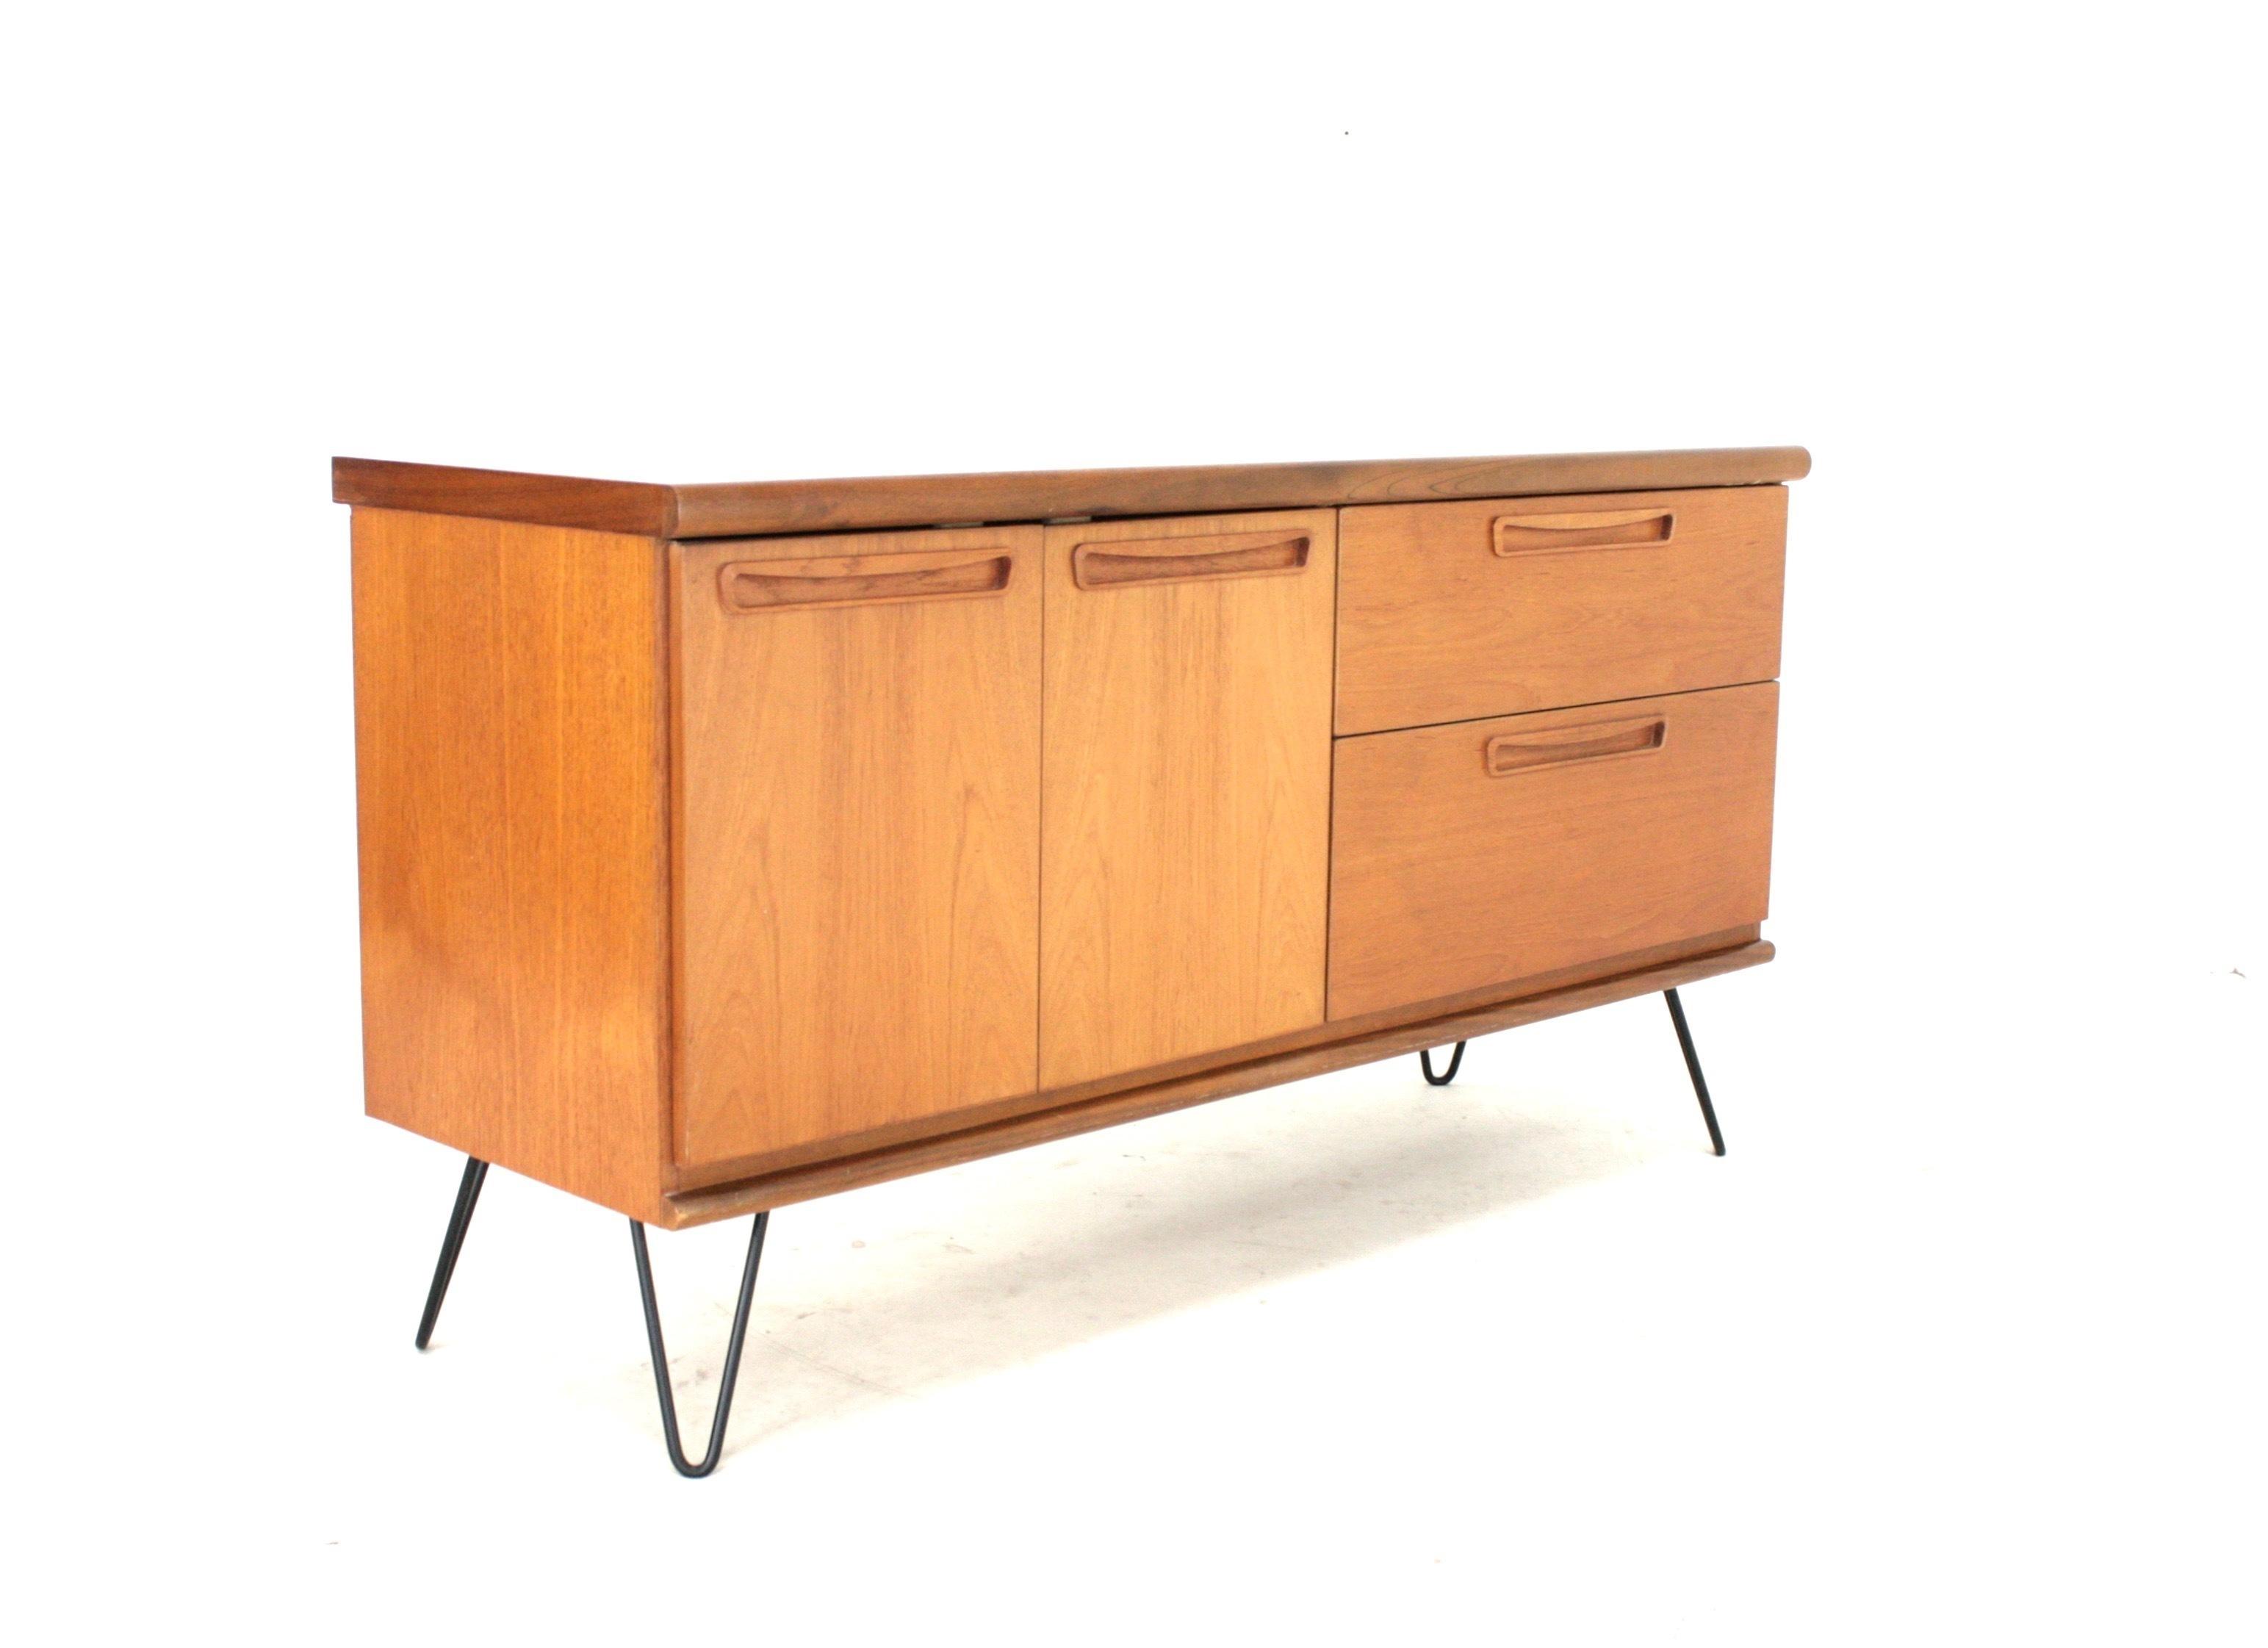 sale retailer c12db 54531 Vintage Mid Century Danish Influence 1970's Teak Sideboard On Hairpin Legs  By Meredew